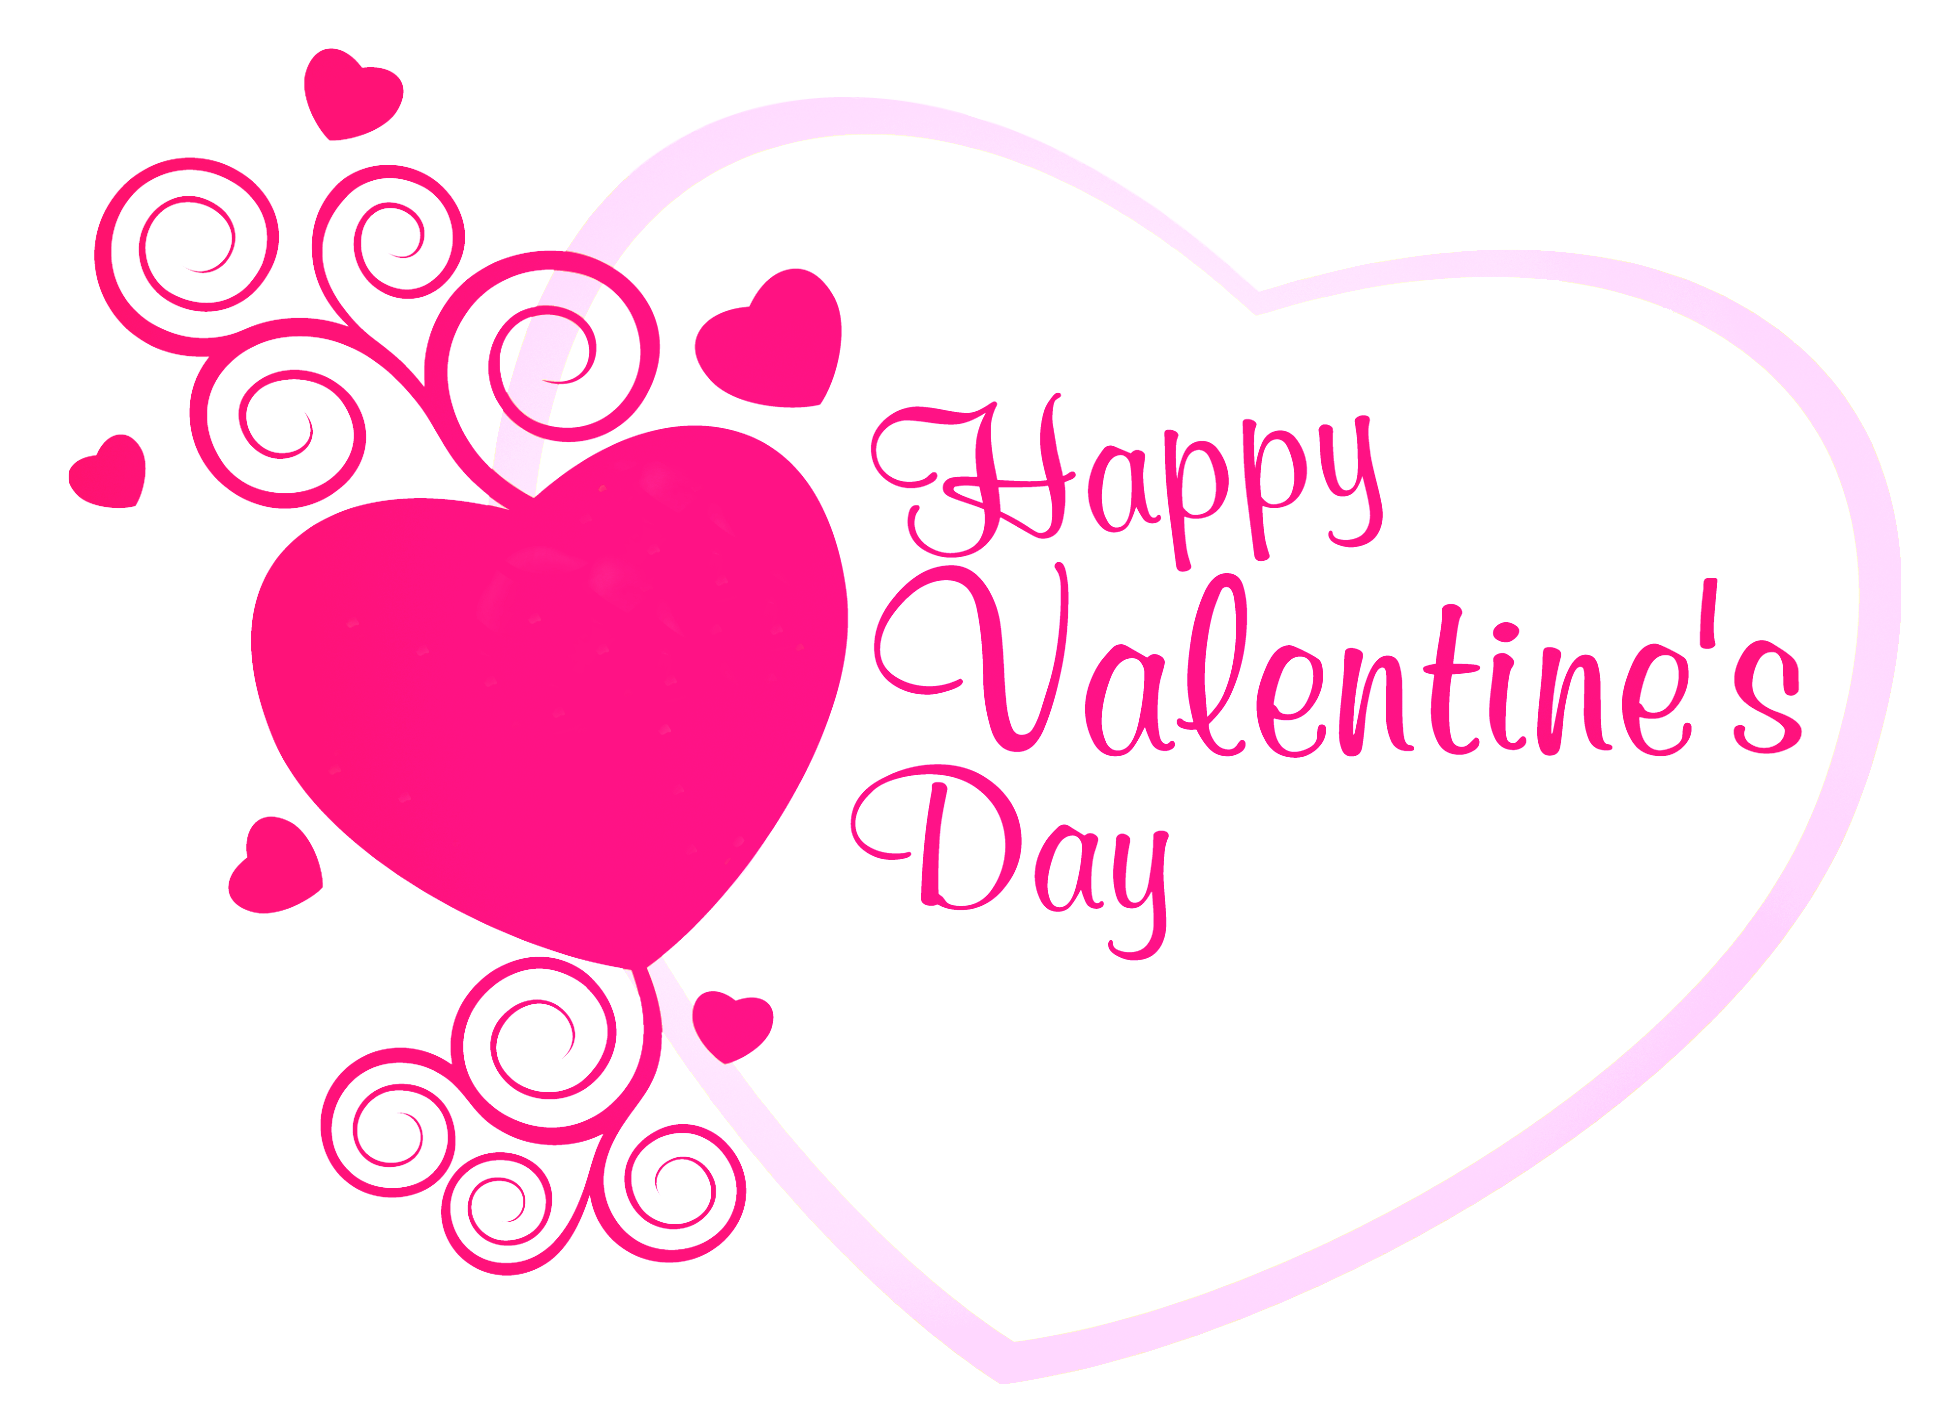 hight resolution of heart clipart valentine s day 3 valentines hearts happy valentines day wishes valentine cupcakes